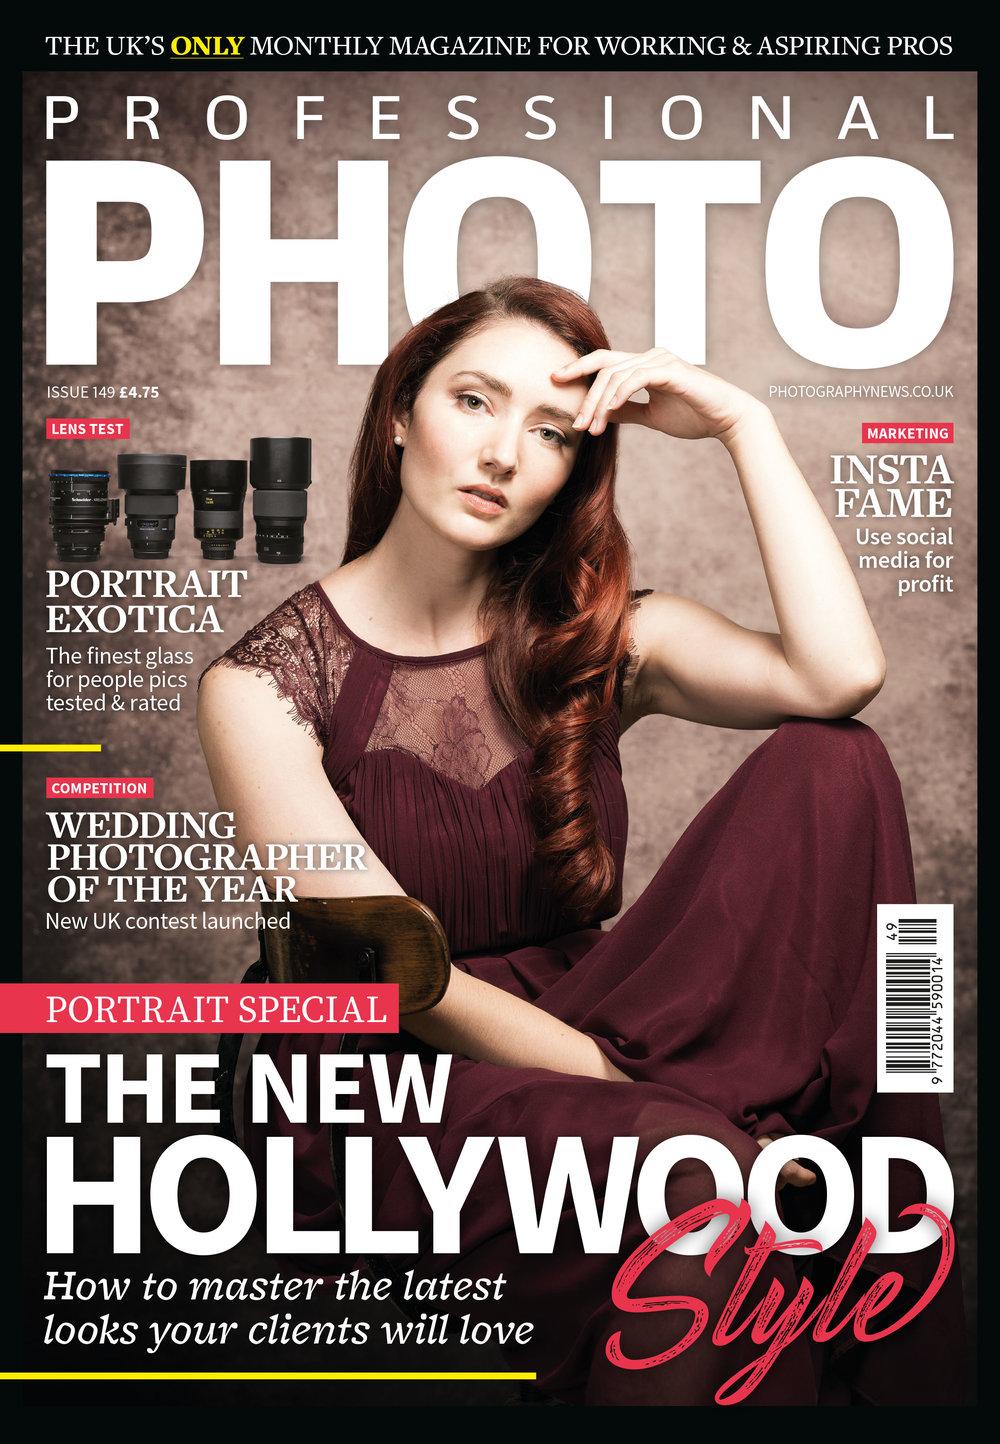 For Professional Photo magazine